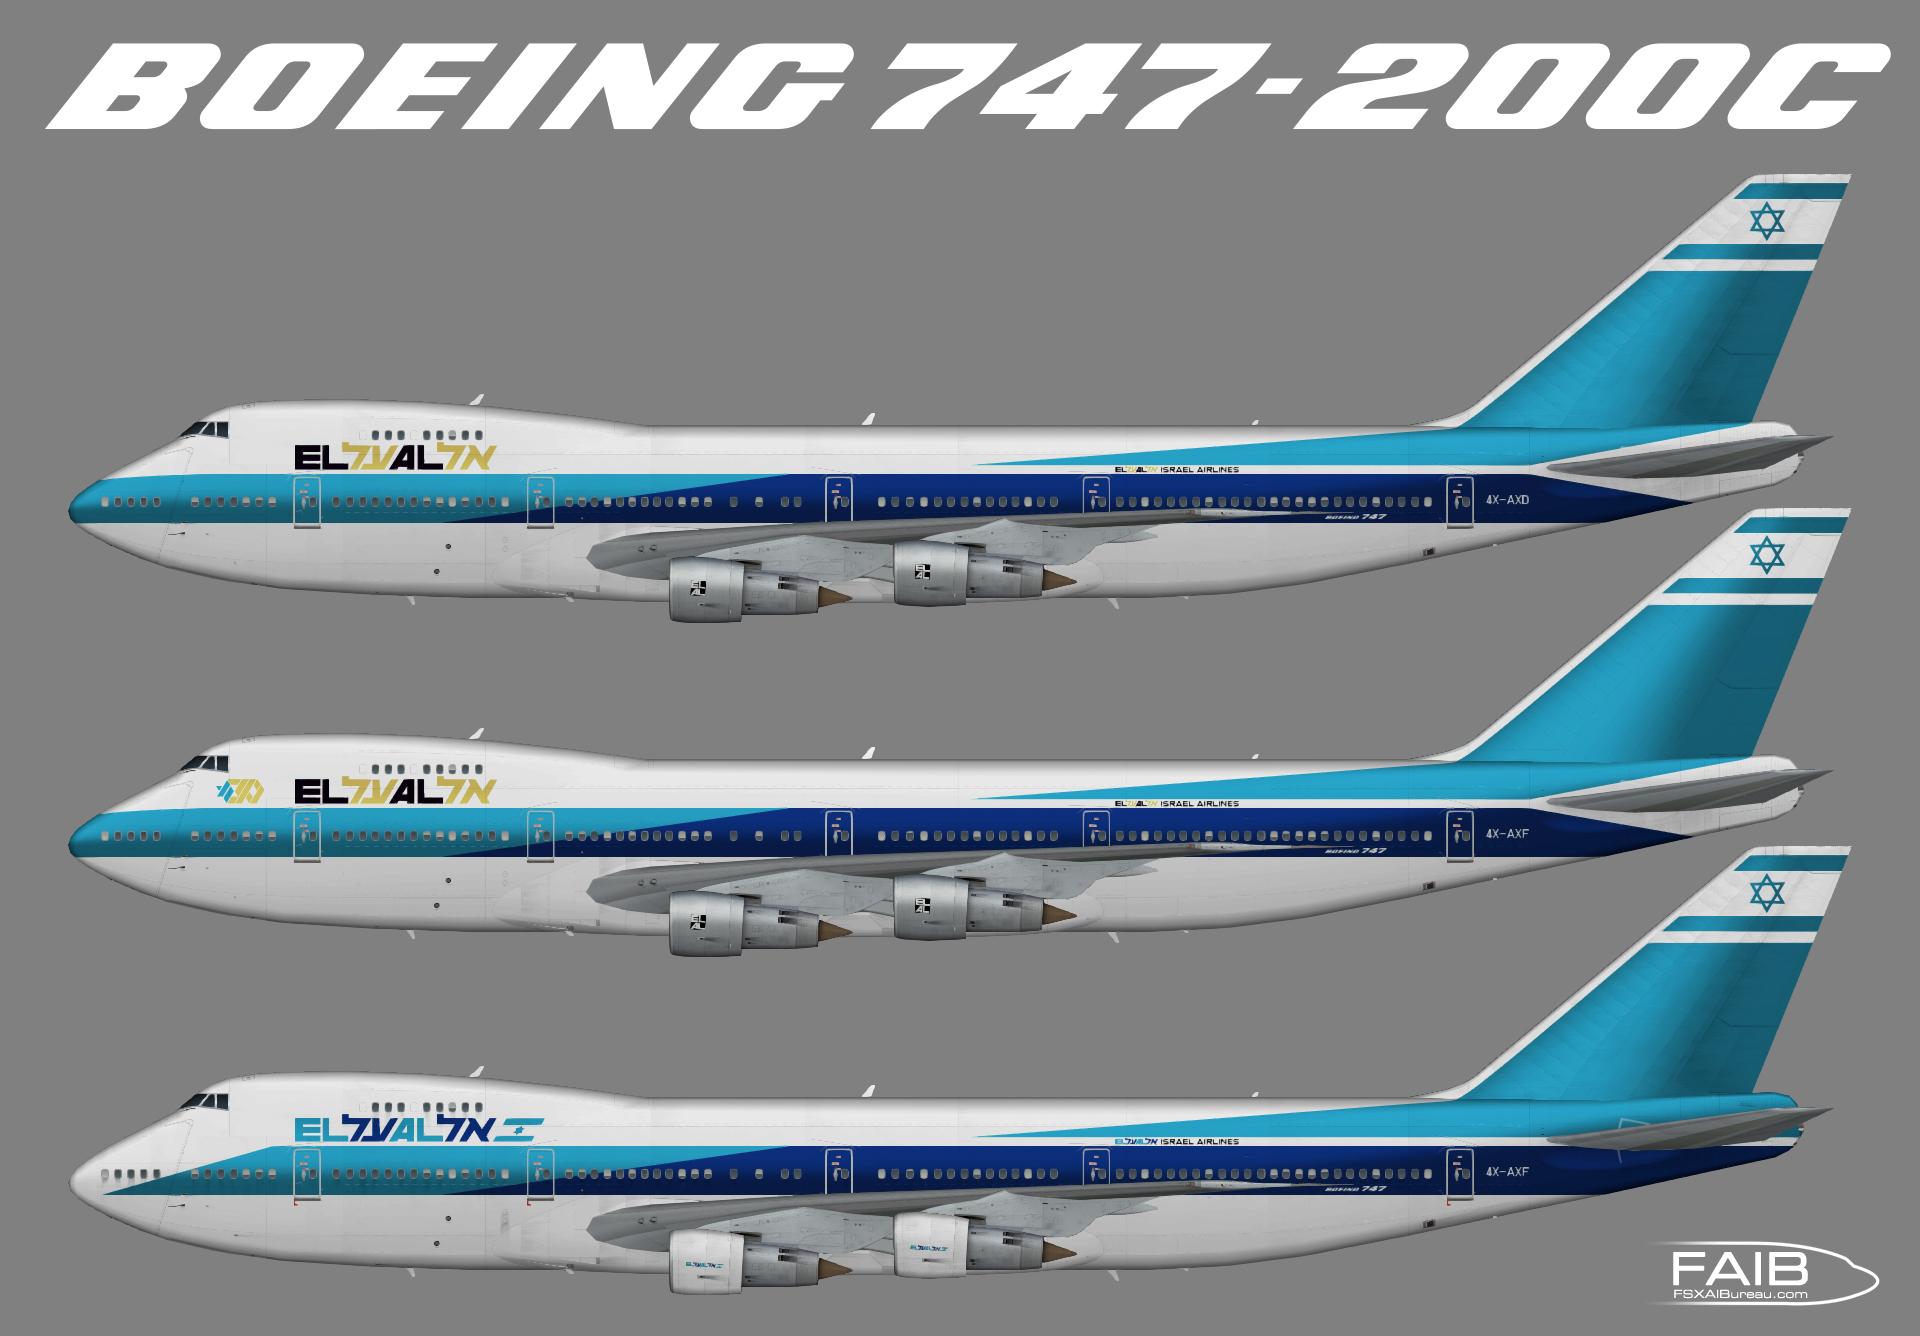 El Al Airlines Boeing 747-200C